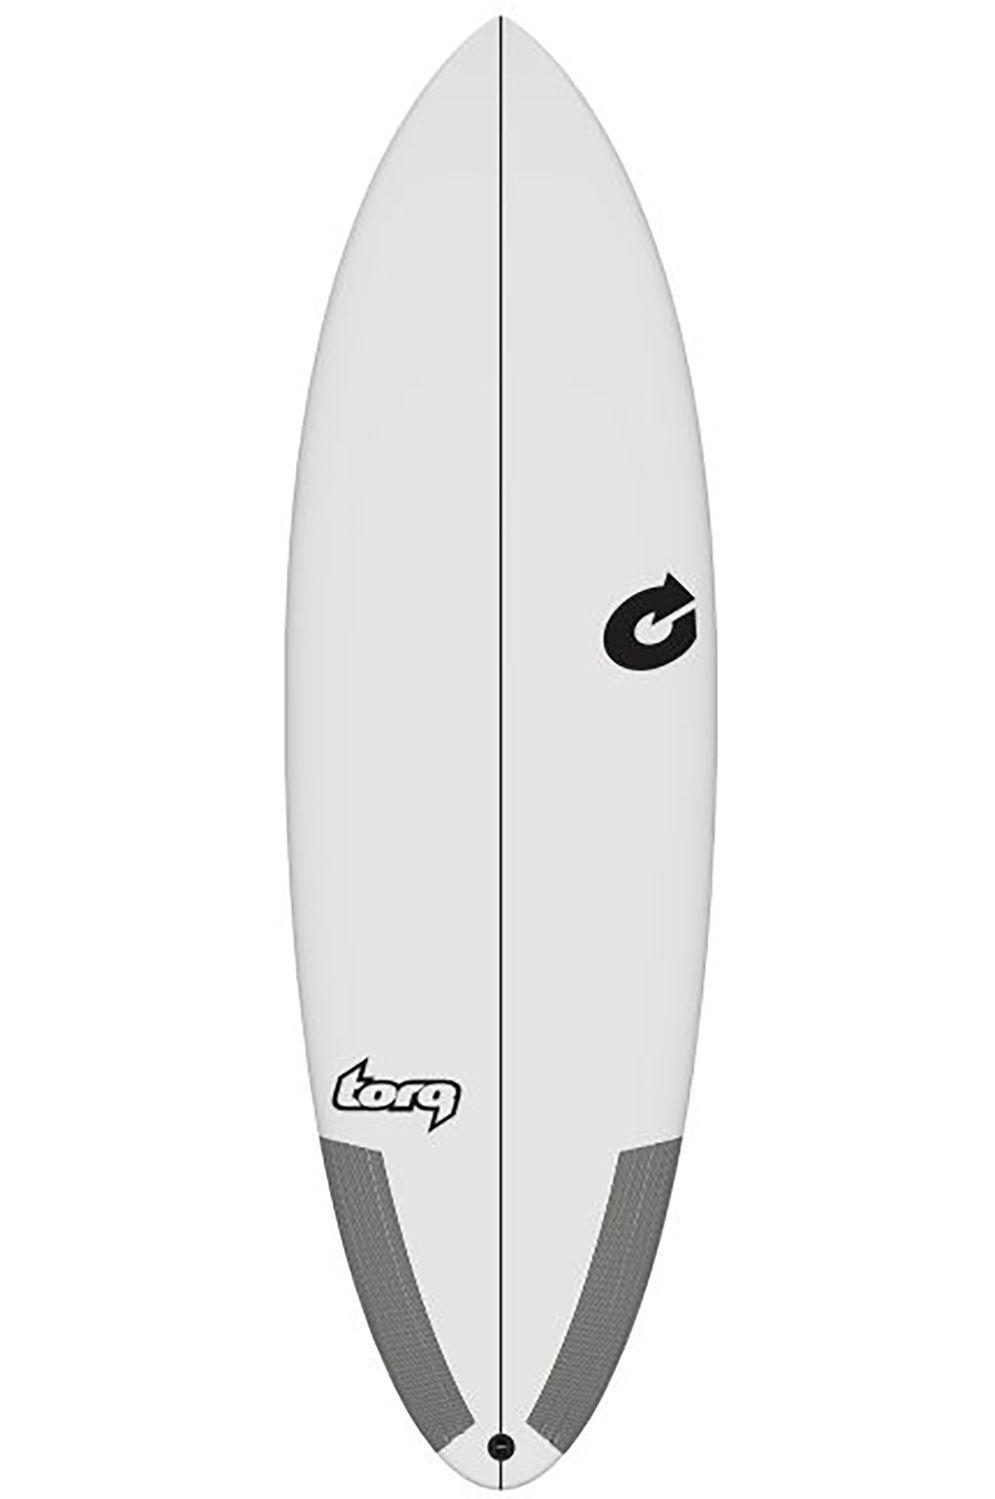 Prancha Surf Torq 6'4 MULTIPLIER WHITE Round Tail - White Futures Multisystem 6ft4